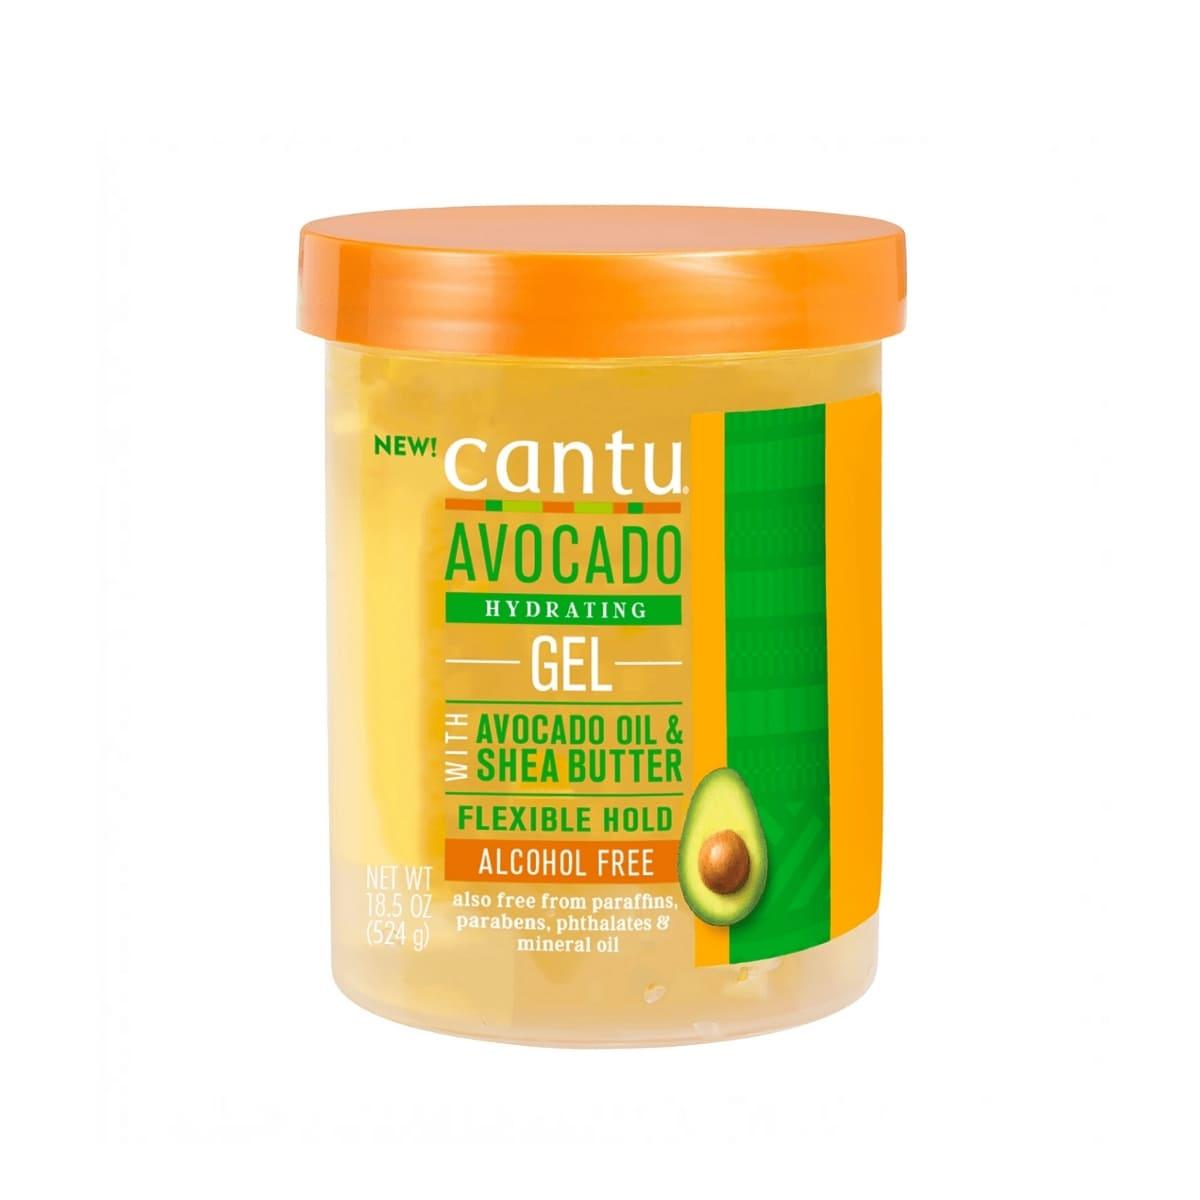 comprar-cosmetico-vegano-gel-avocado-oil-&-shea-butter-cantu-metodo-curly-trenzas-crochet-pelucas-www.muerebella.com